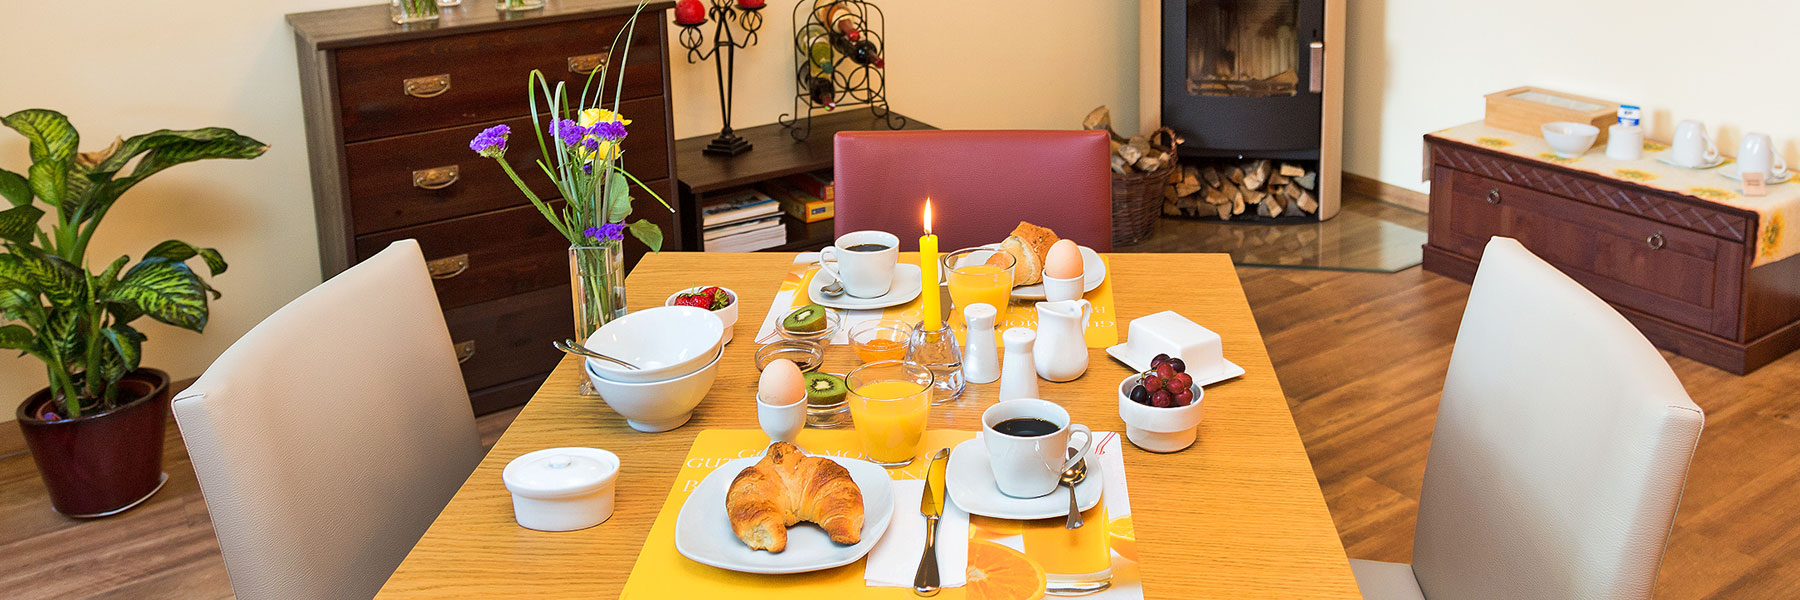 Frühstück - Landhaus Rügeband